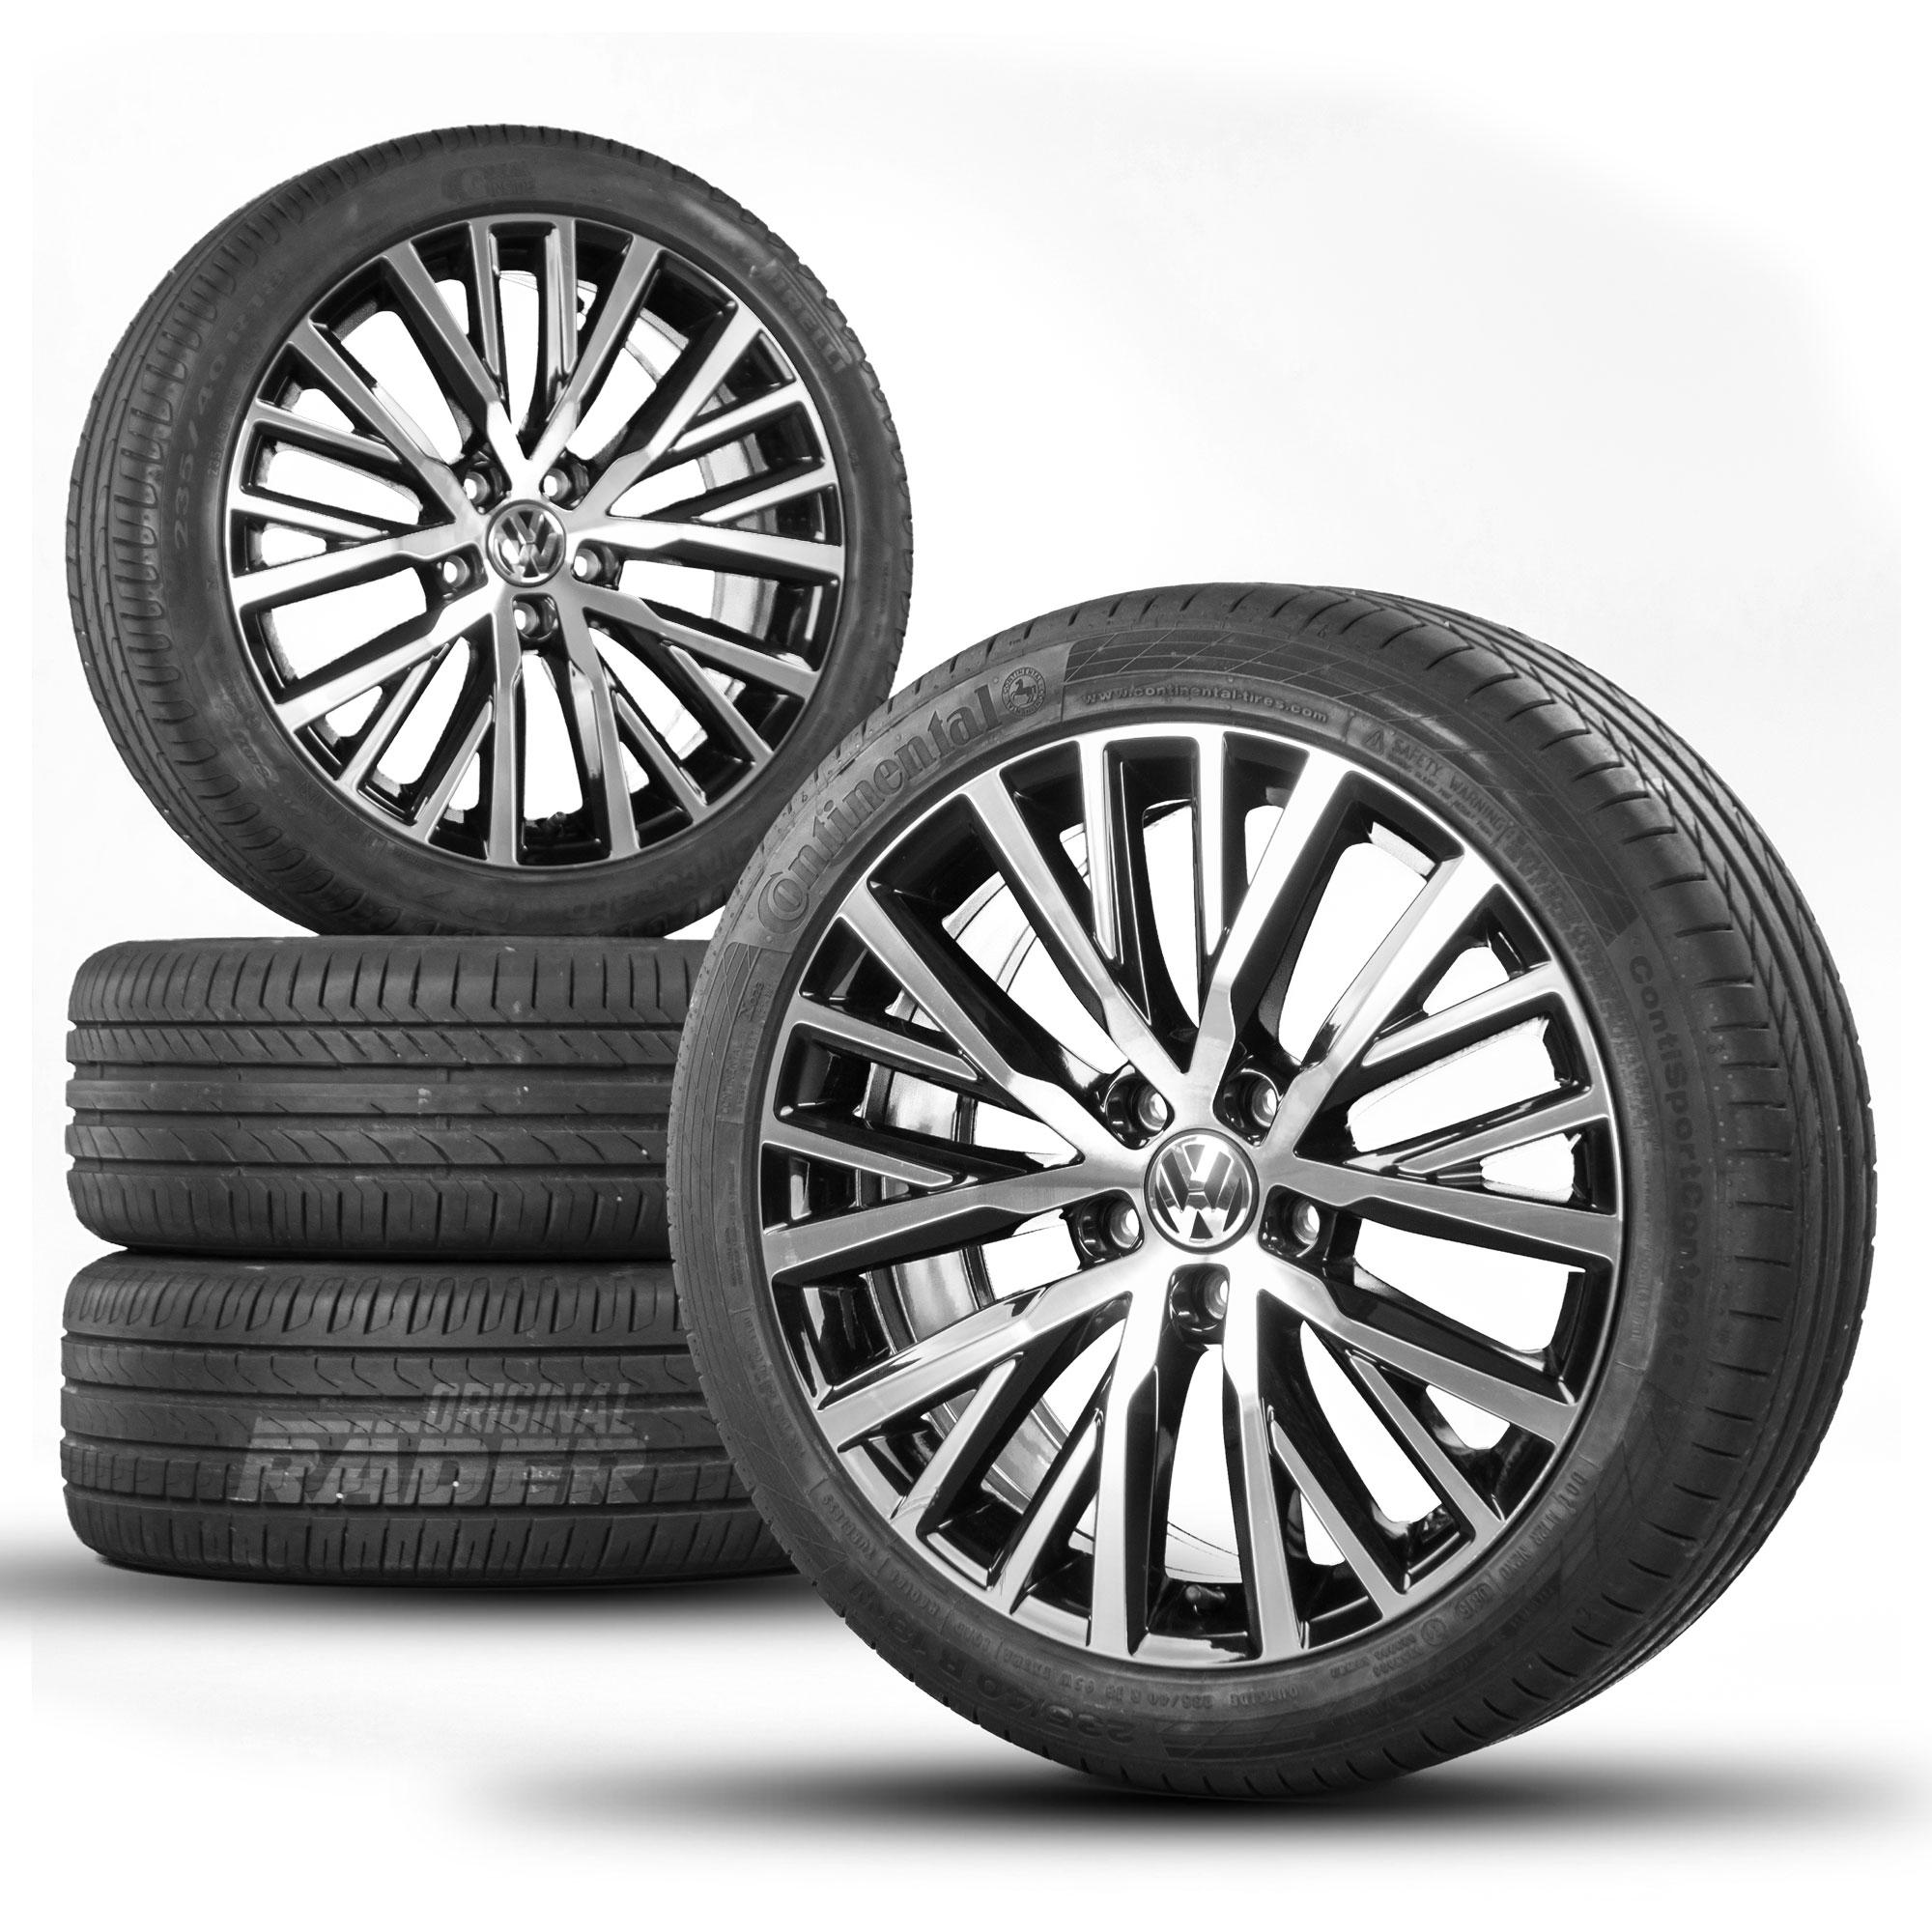 vw passat 3c cc scirocco 18 inch alloy wheels rims summer tires r line ebay. Black Bedroom Furniture Sets. Home Design Ideas